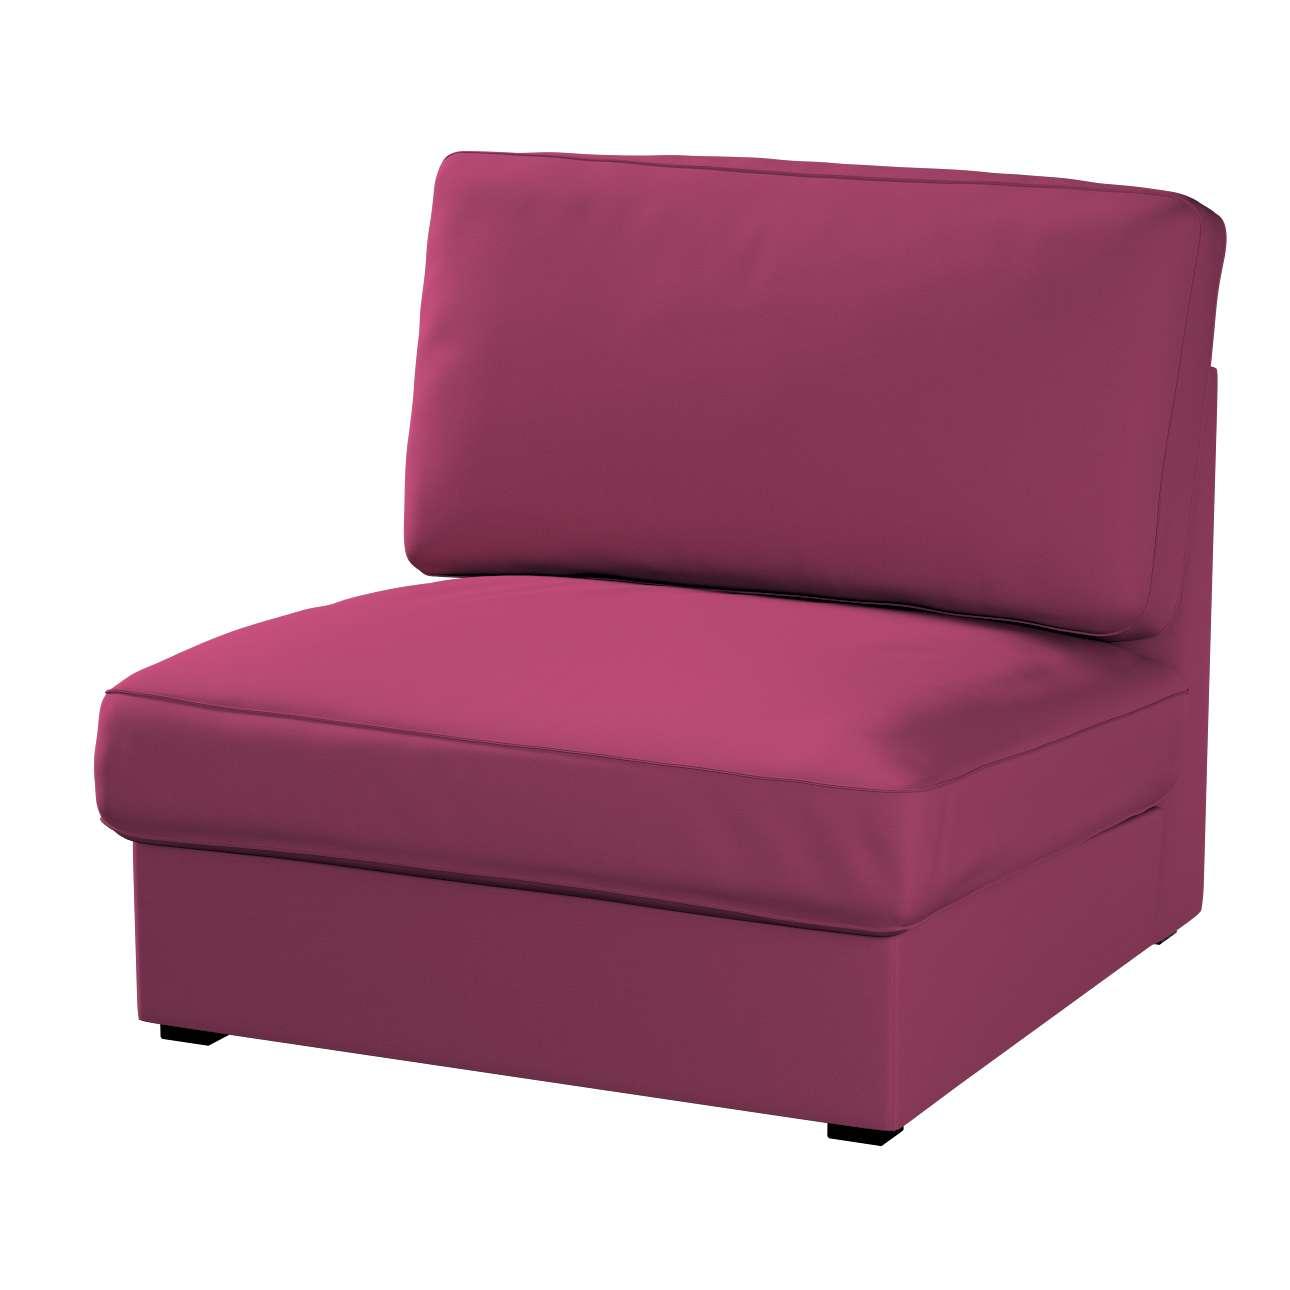 Pokrowiec na fotel Kivik Fotel Kivik w kolekcji Cotton Panama, tkanina: 702-32